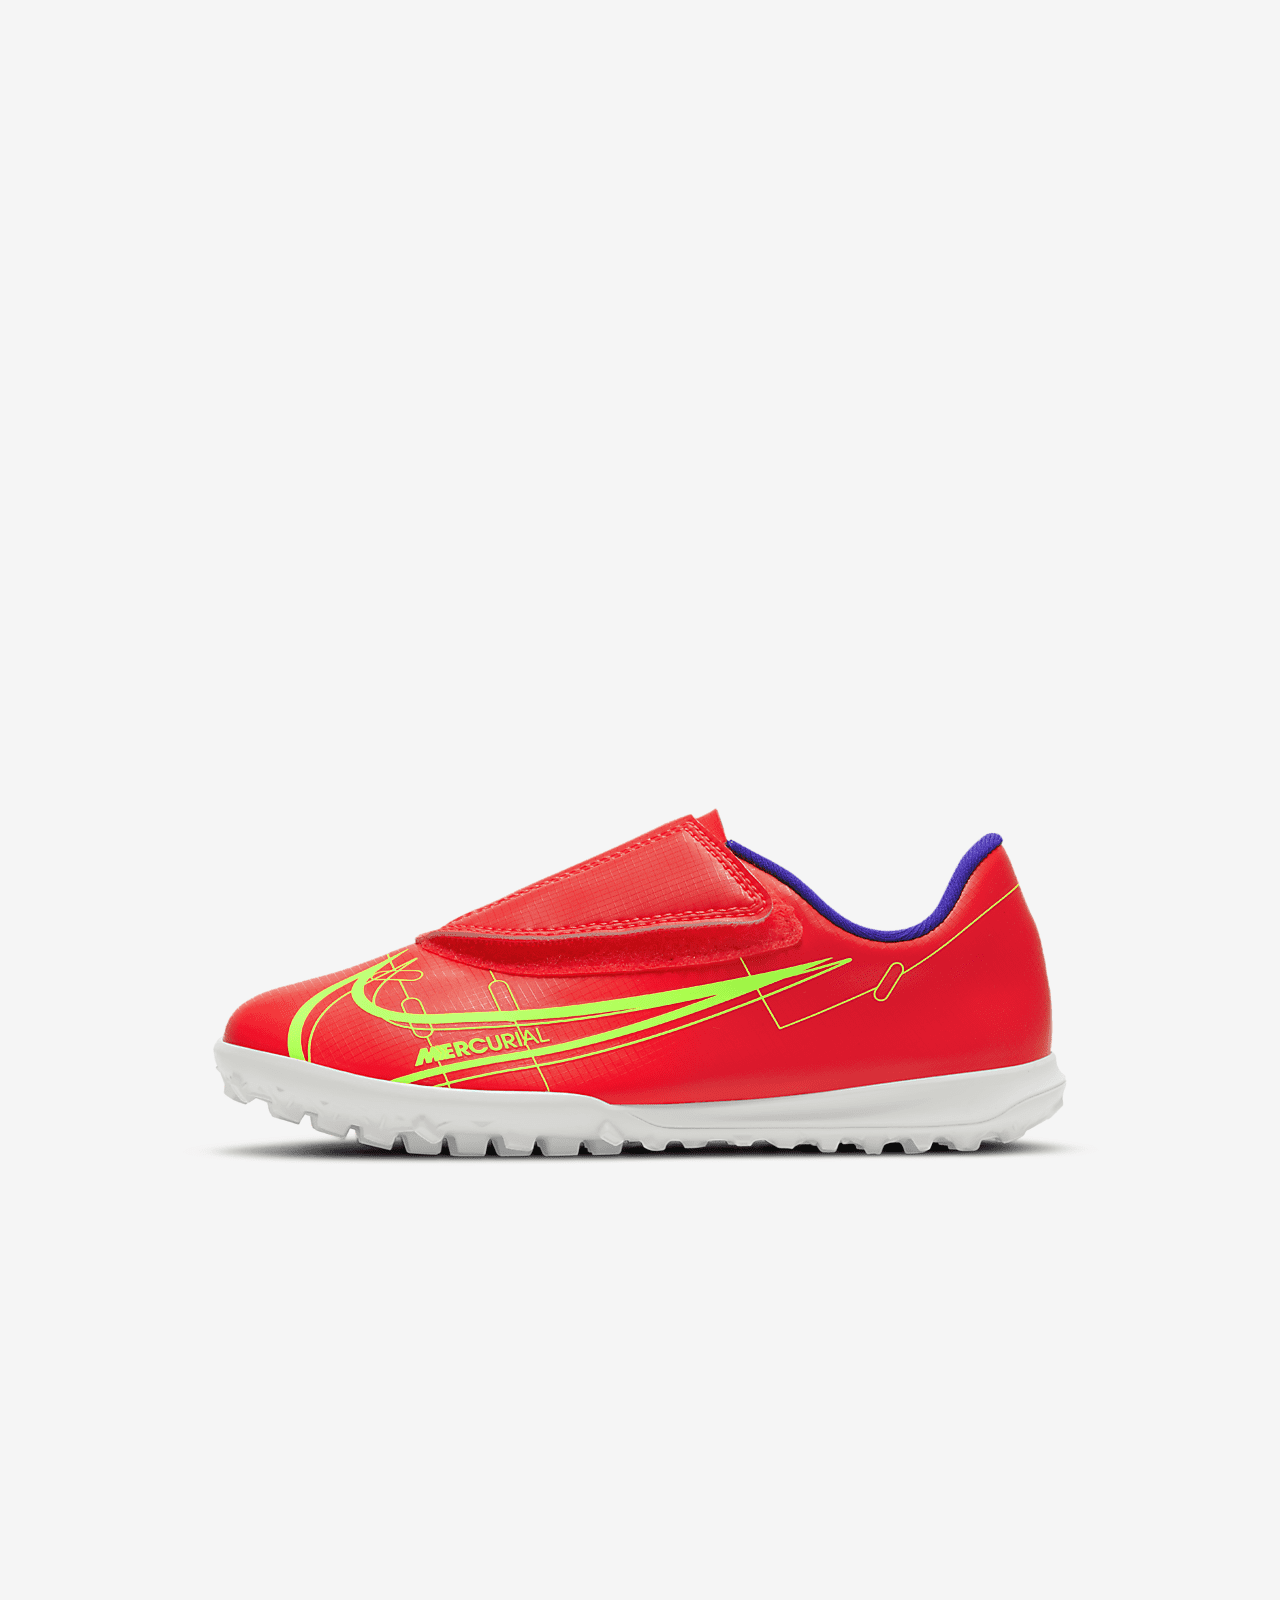 Nike Jr. Mercurial Vapor 14 Club TF Little Kids' Turf Soccer Shoe